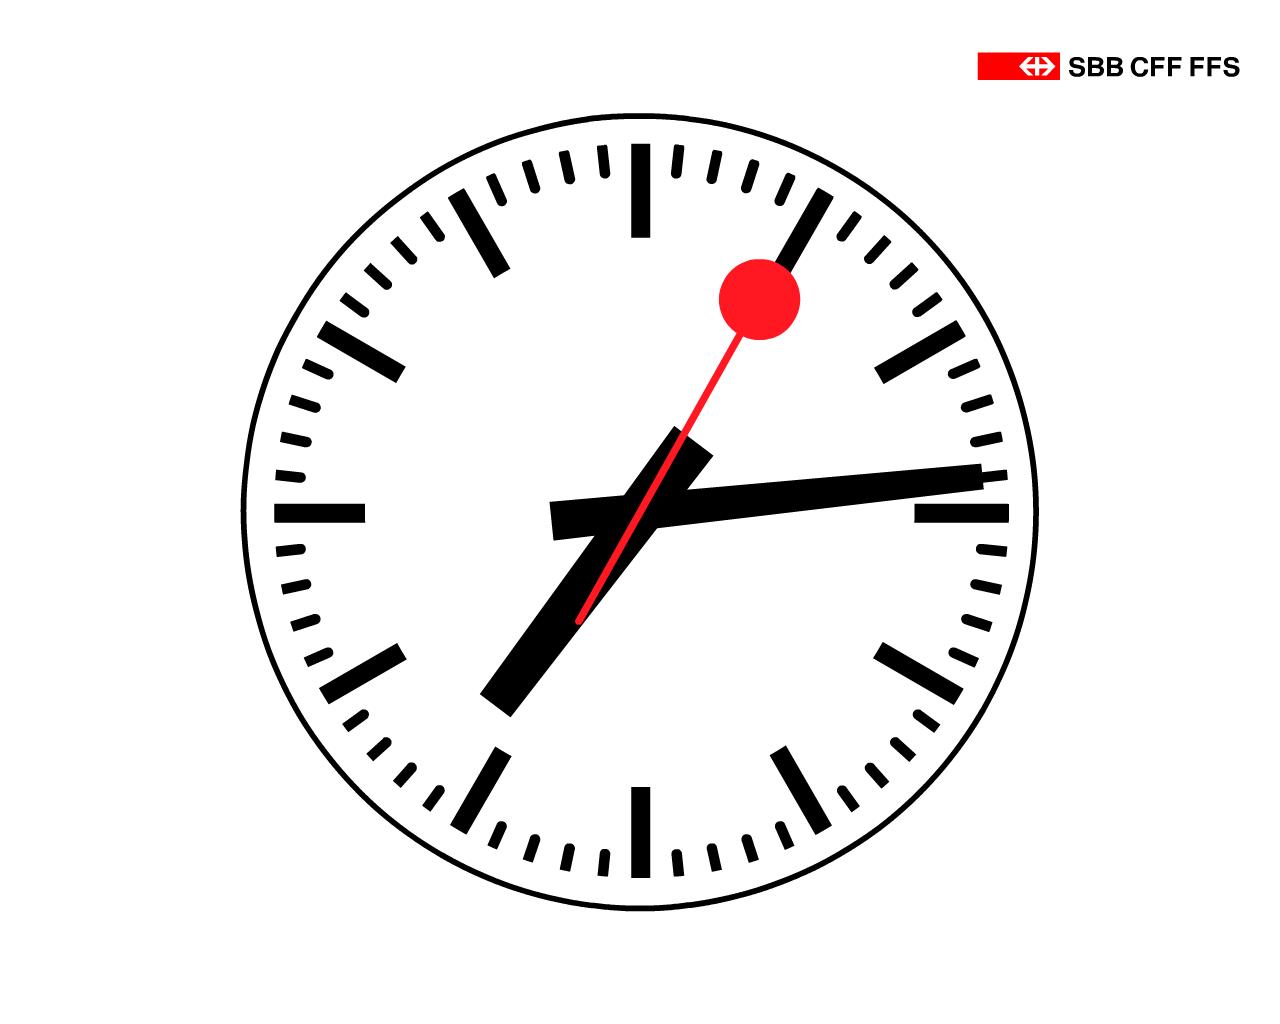 Pinterest the world s catalog of ideas - Swiss railway wall clock ...